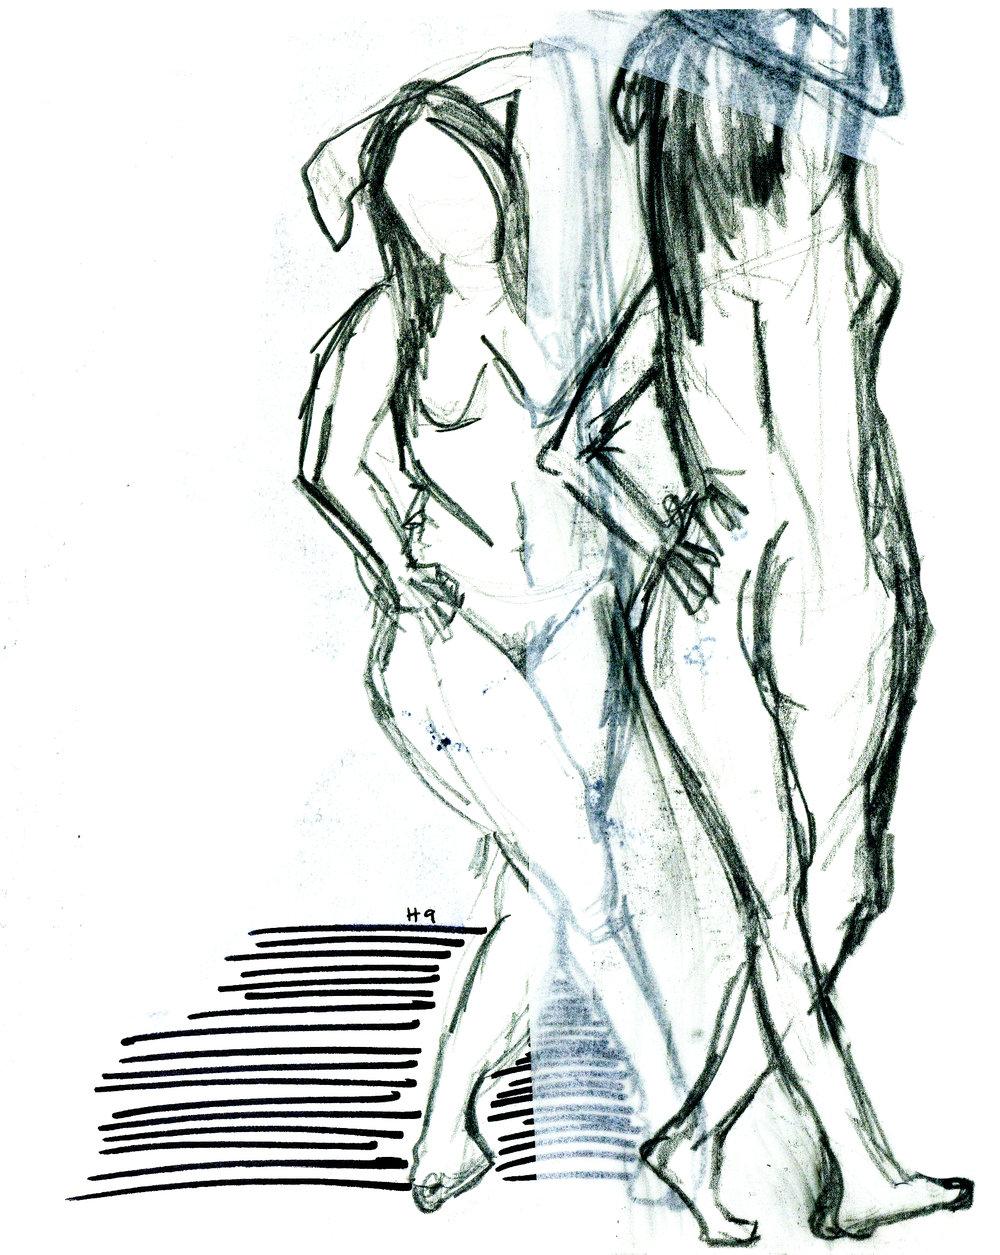 willow-sketch-2.jpg